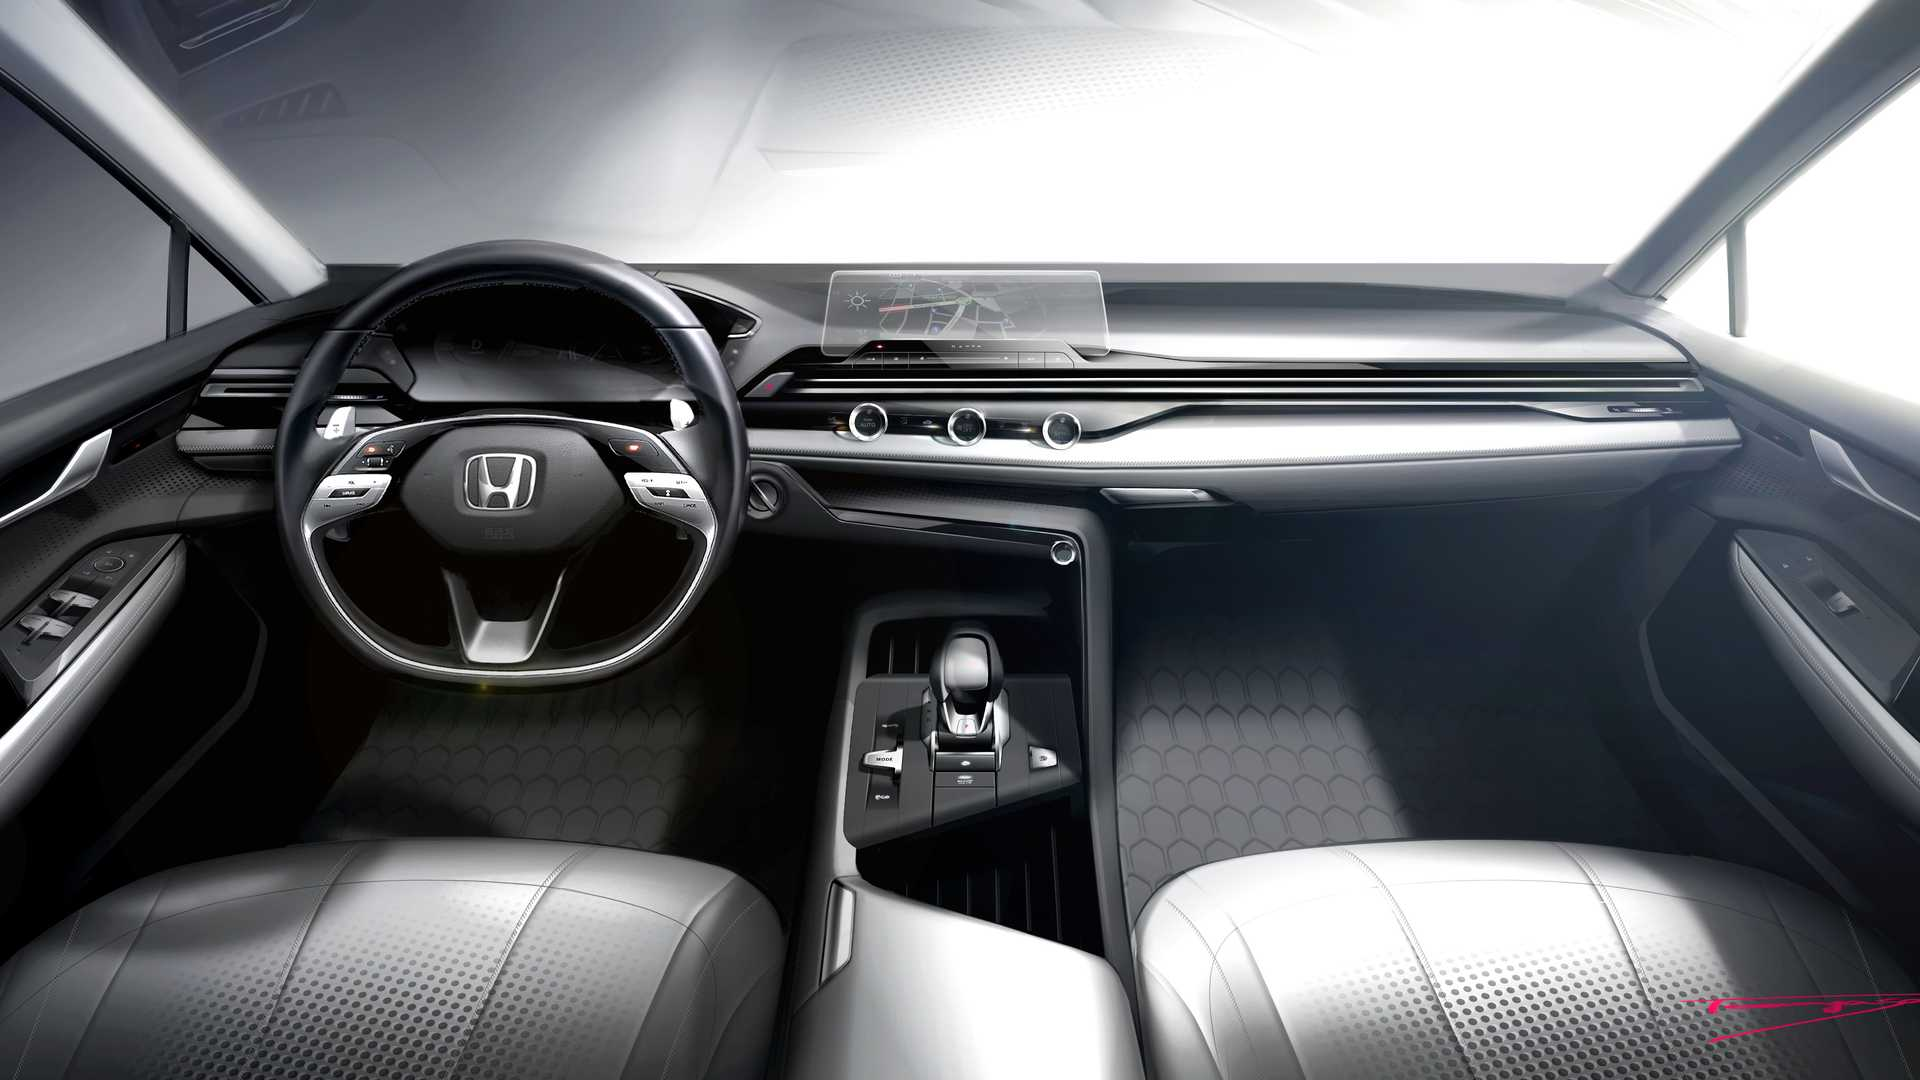 https://cdn.motor1.com/images/mgl/yk61q/s6/honda-new-interior-design-language.jpg